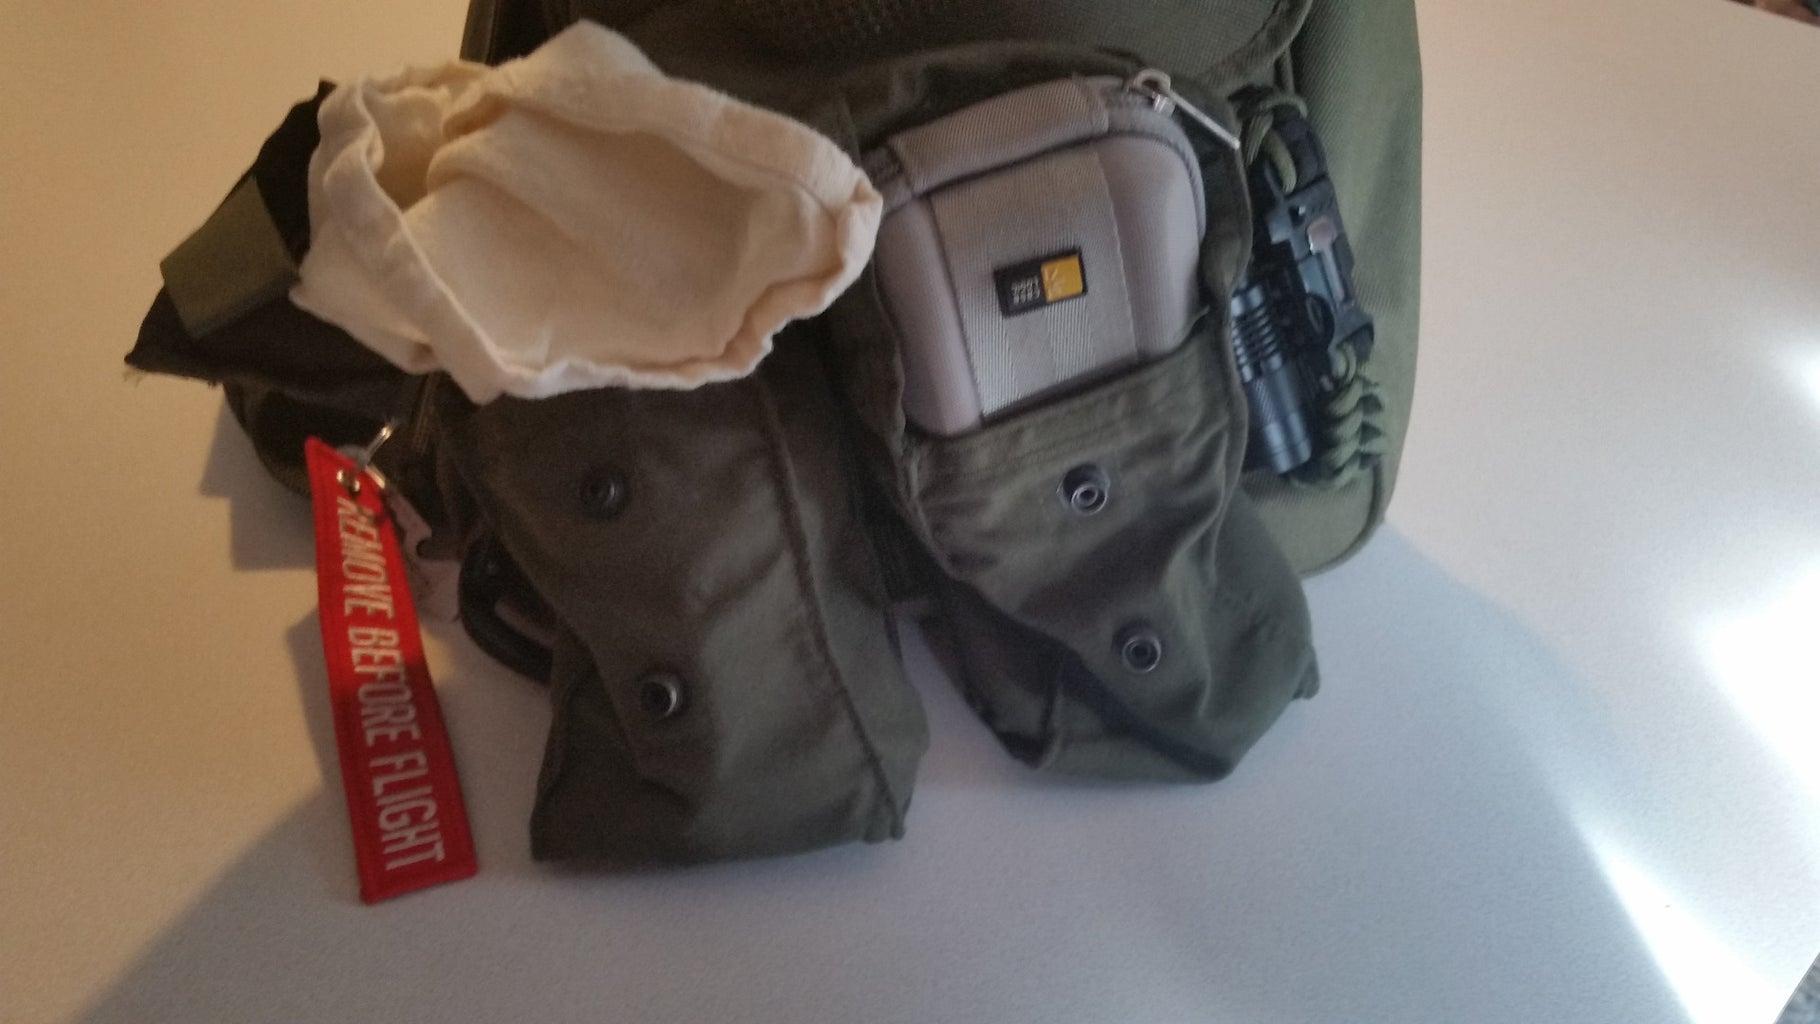 My Kit Stowed on My Bag